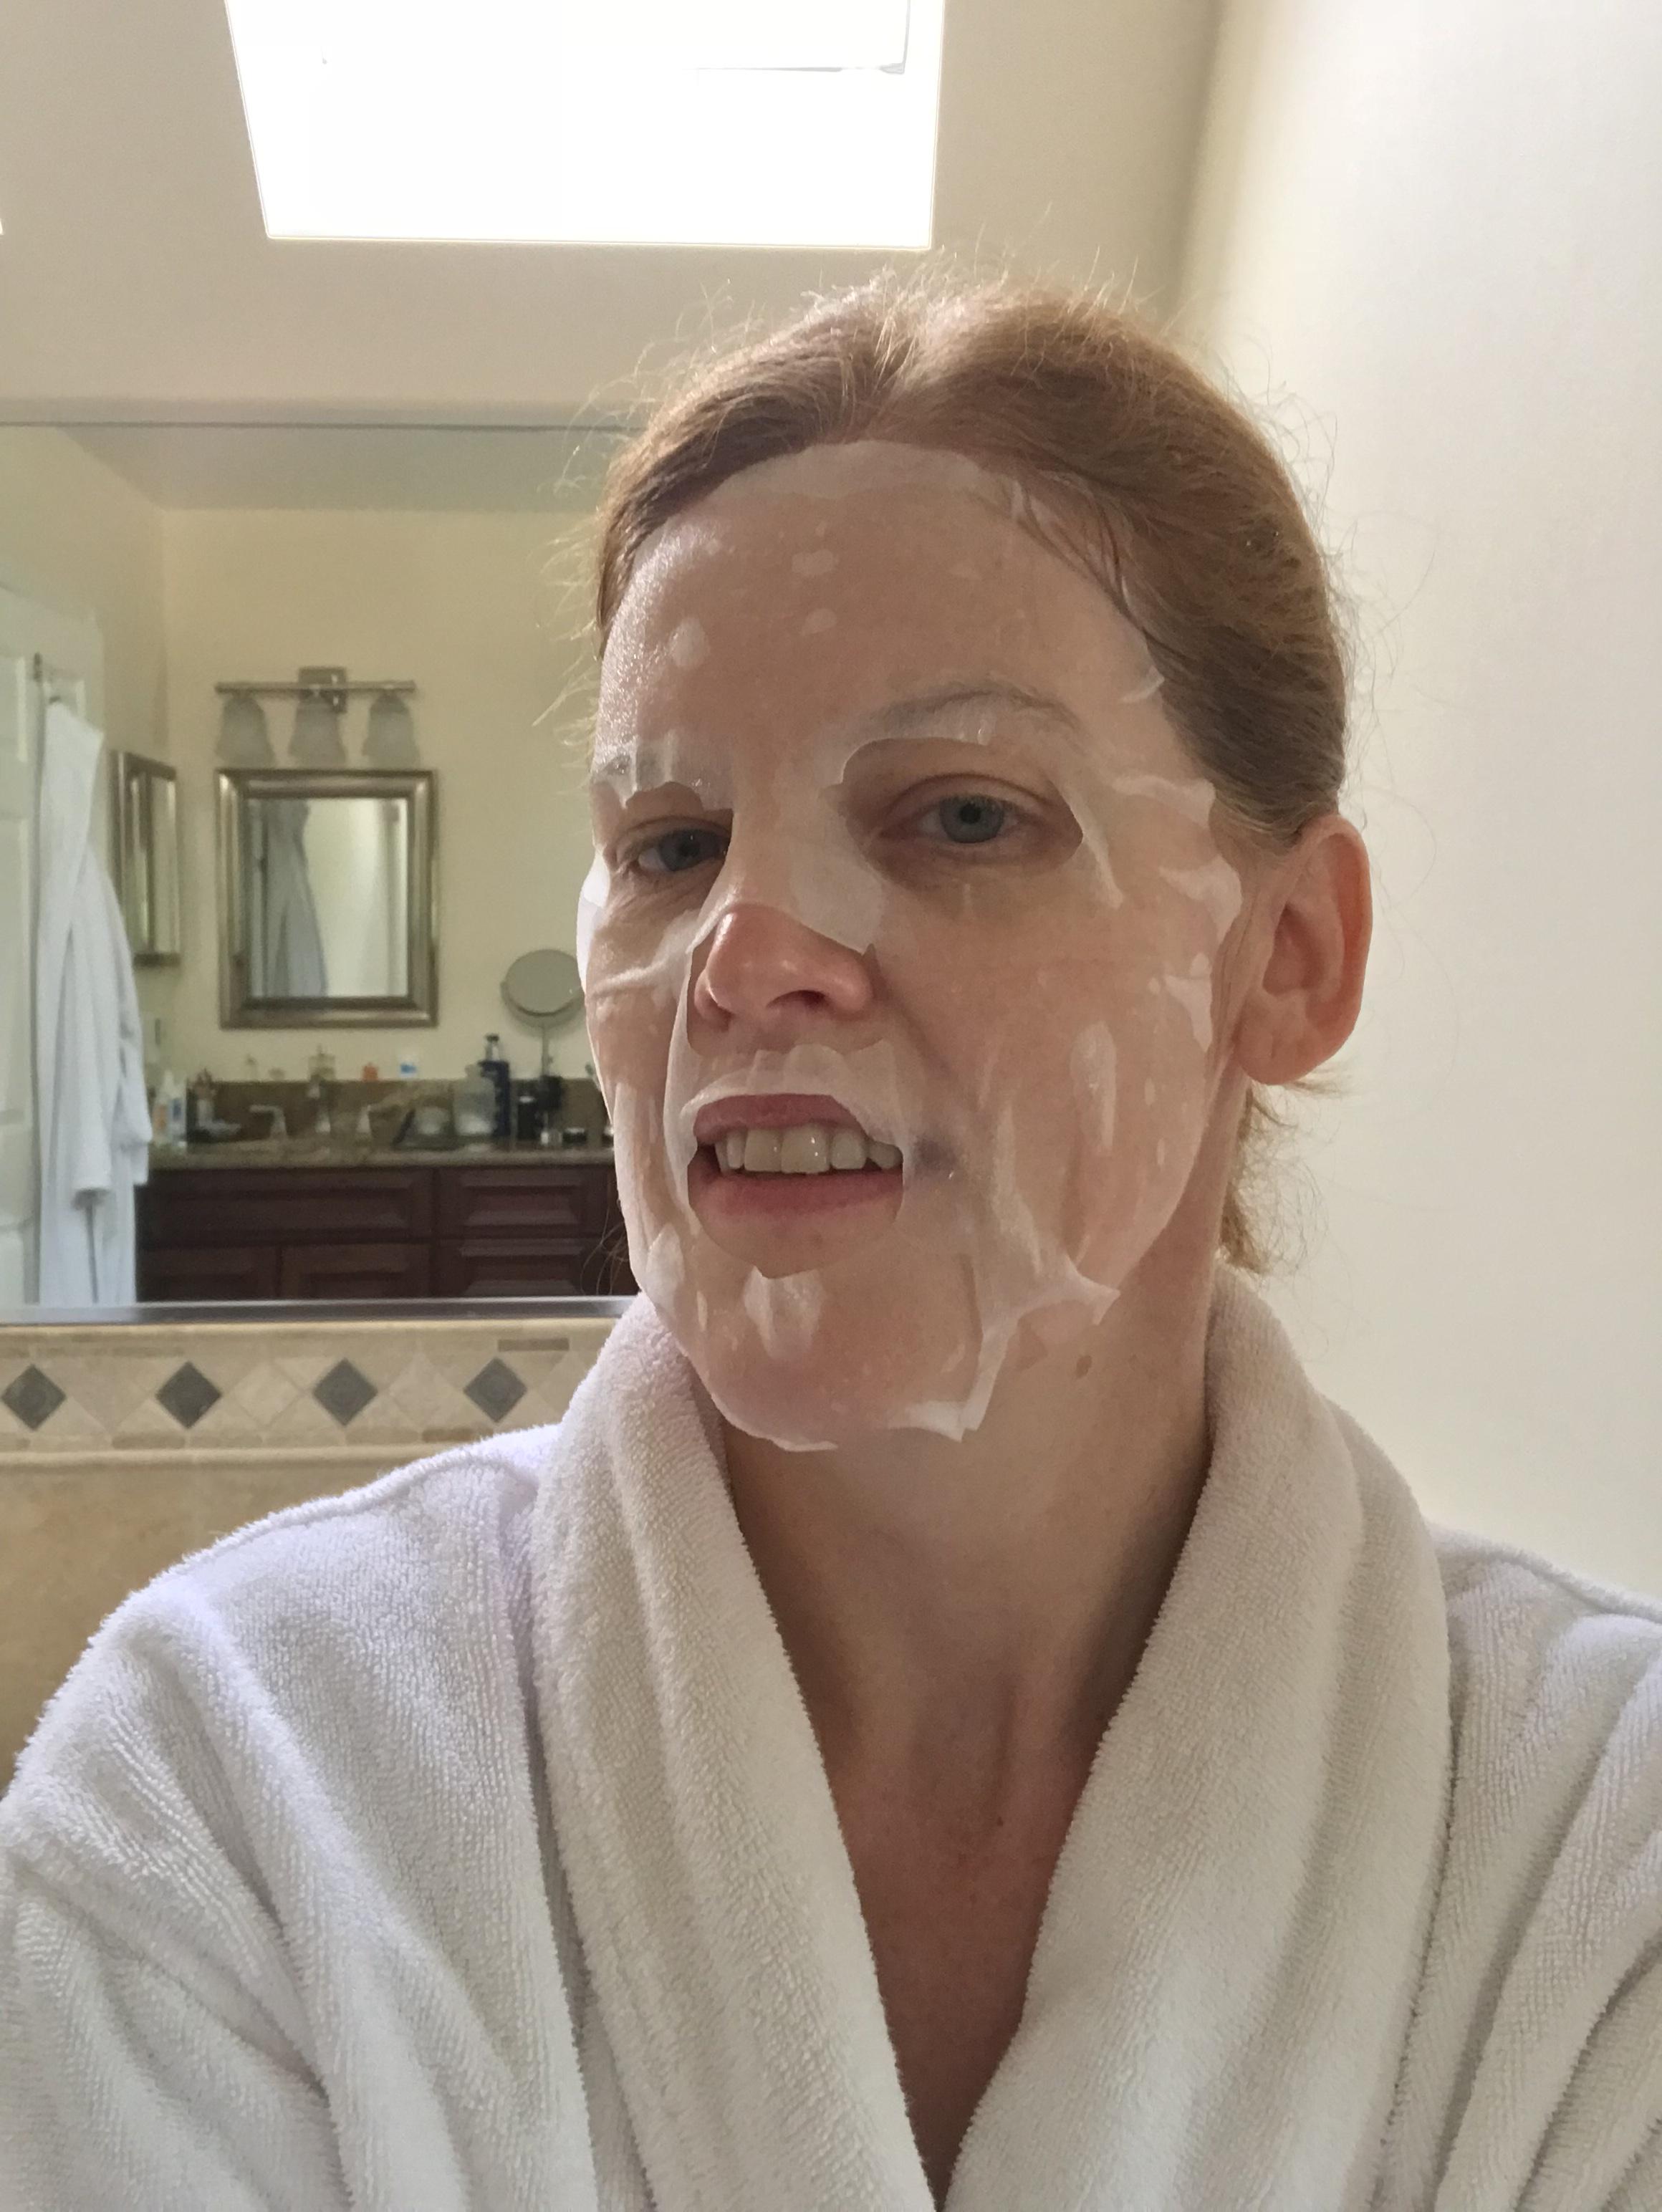 Korean Skin Care 5 Step Routine: Saranghae Review